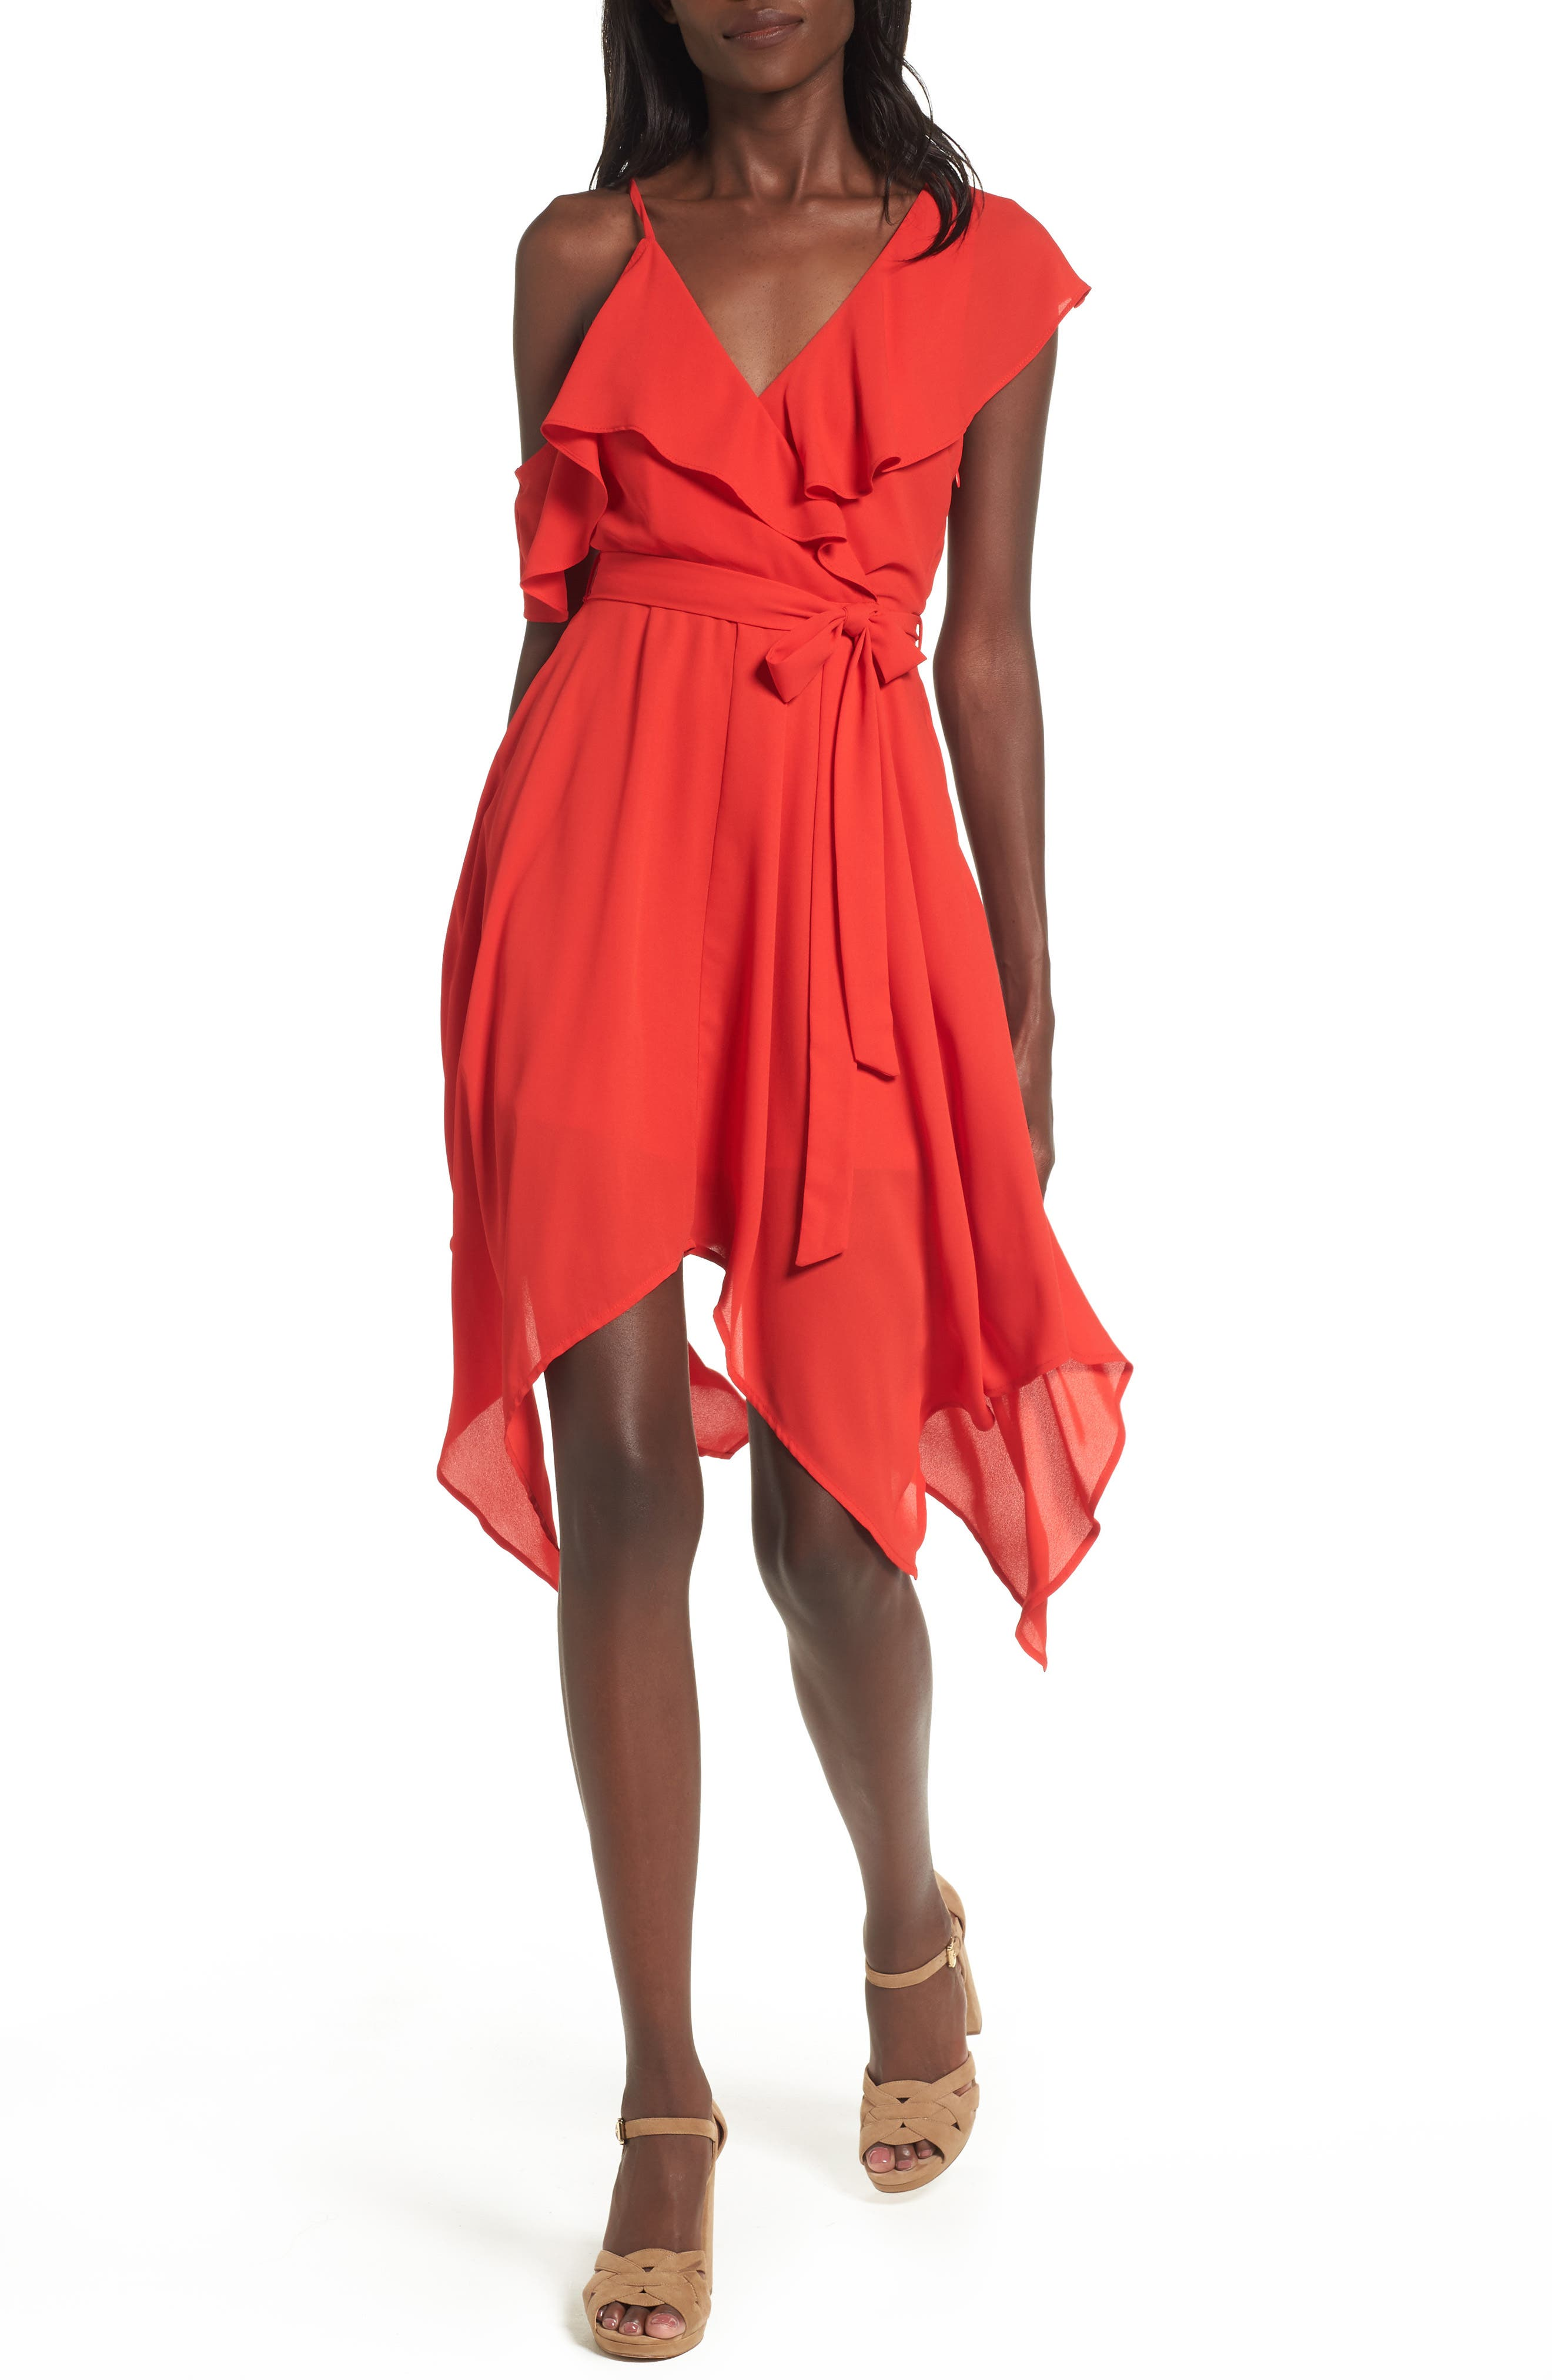 Alternate Image 1 Selected - Dee Elly Asymmetrical Ruffle Dress